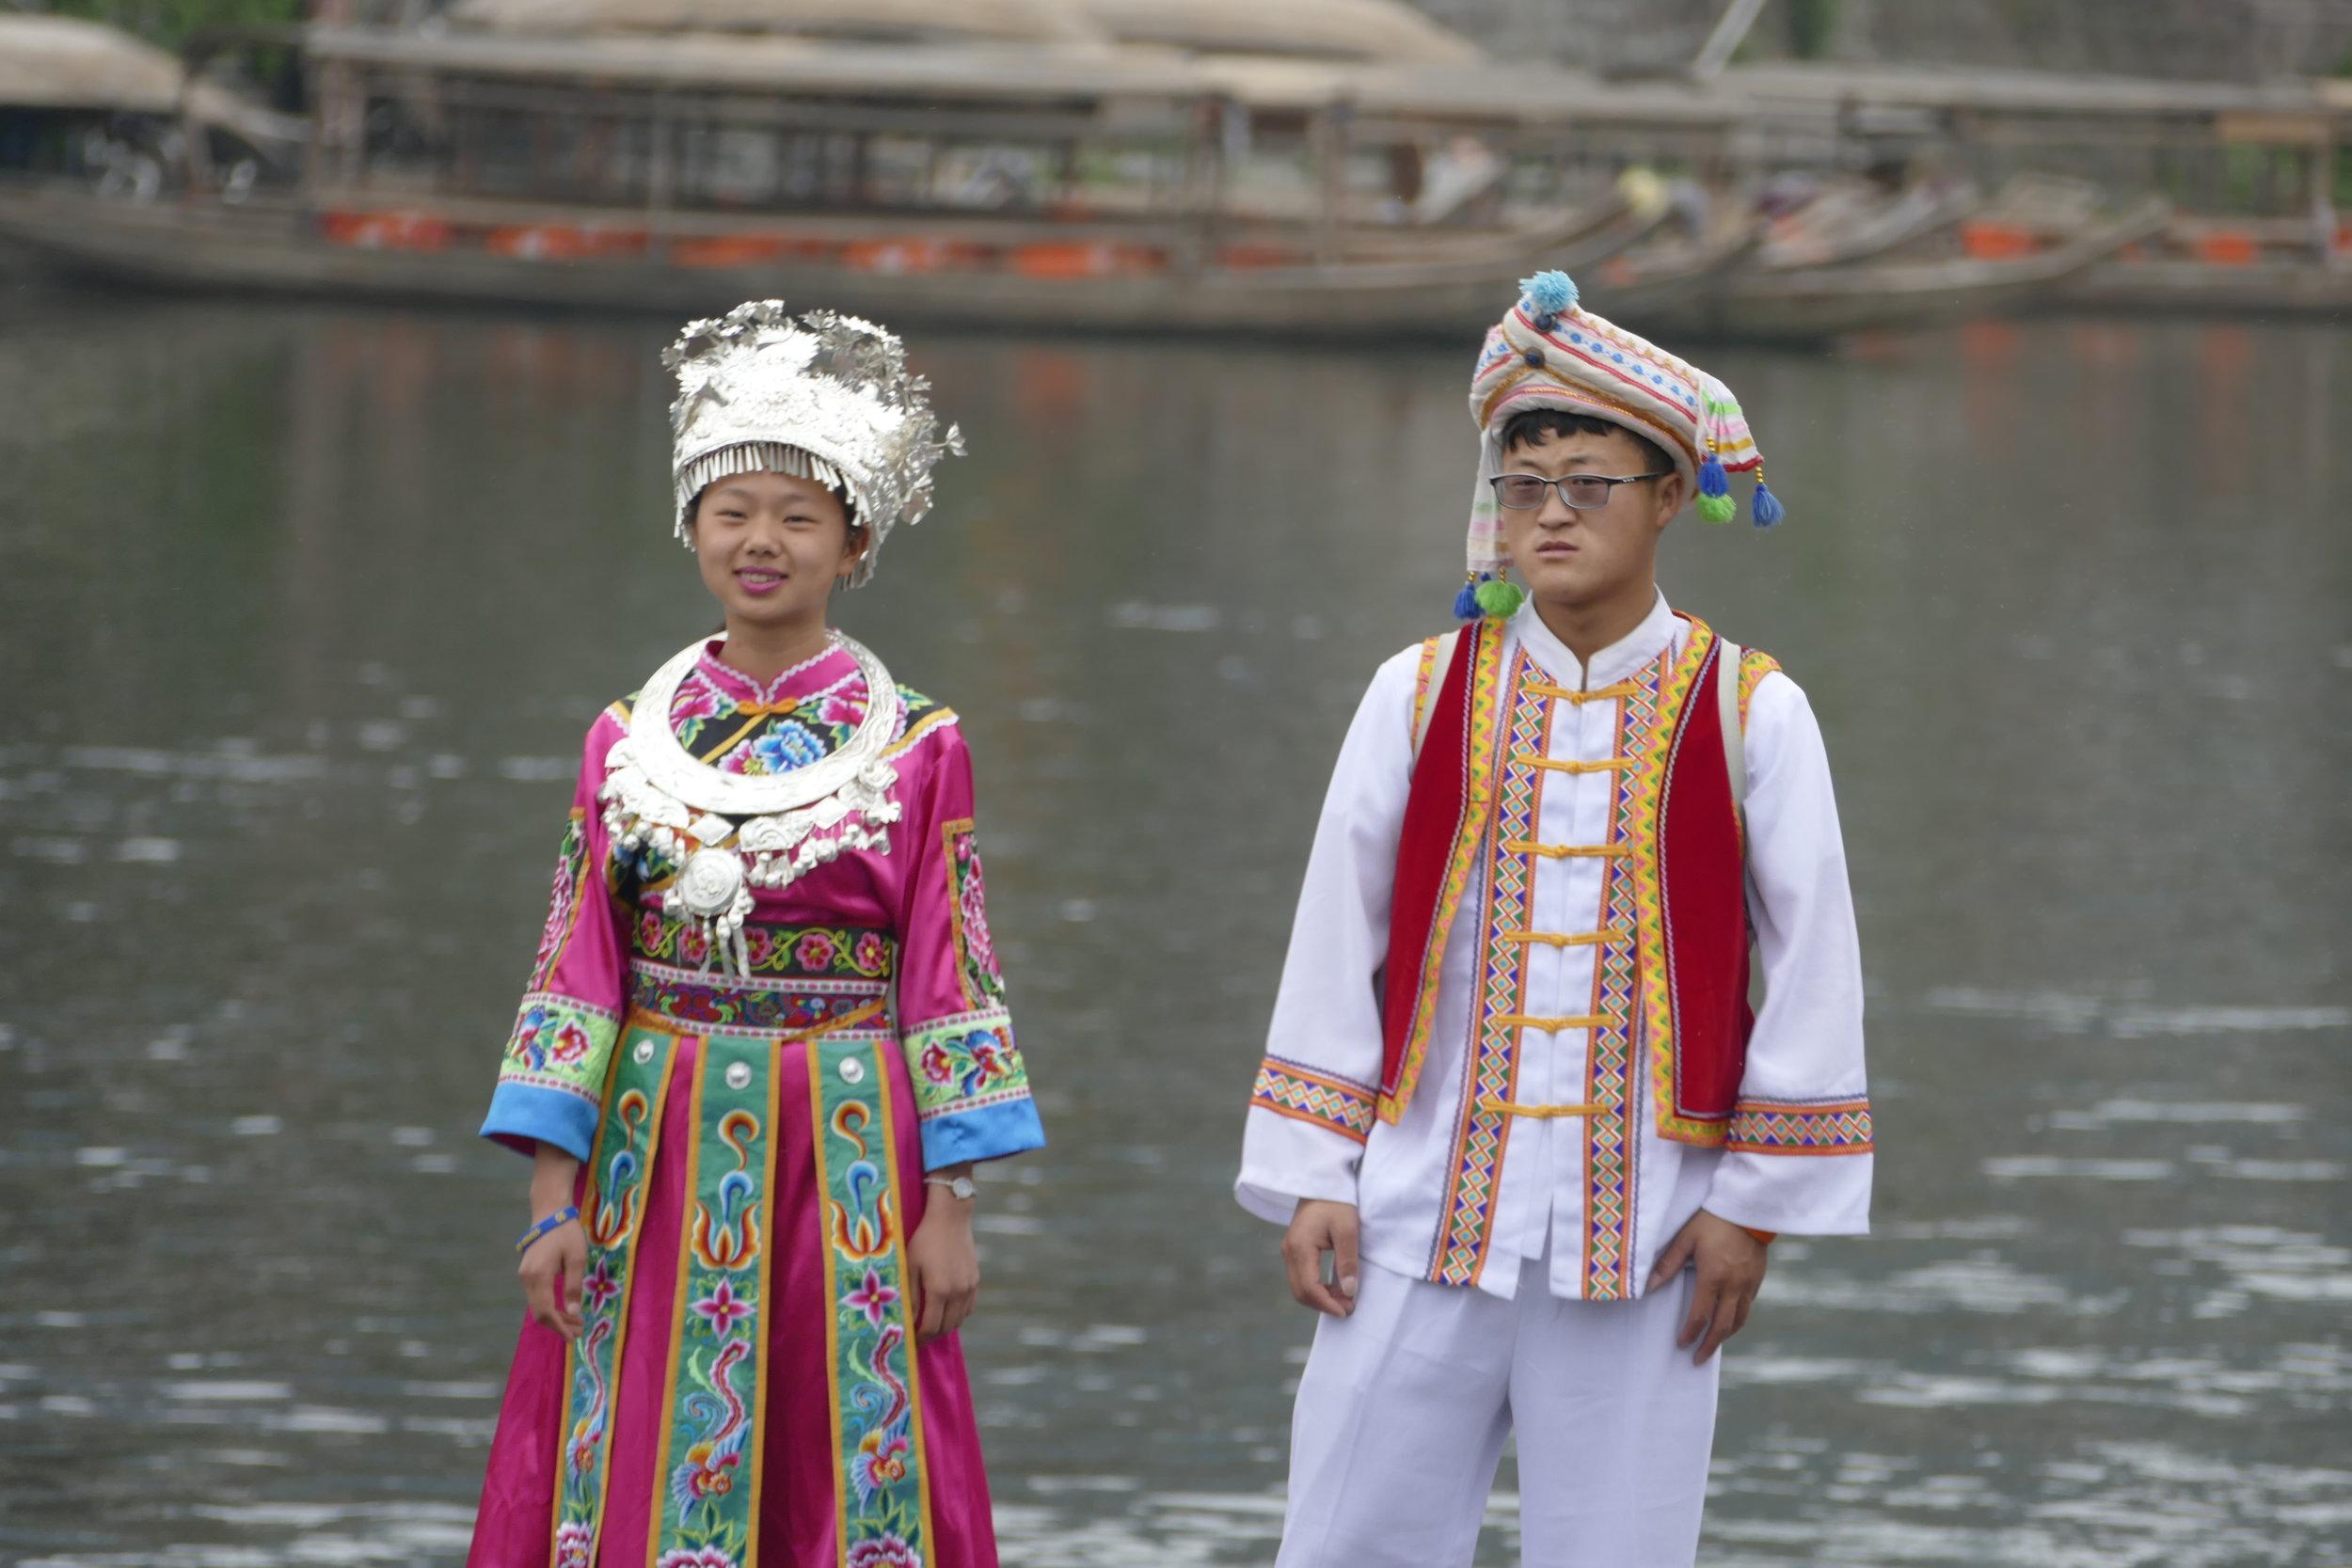 Posing in minority costumes